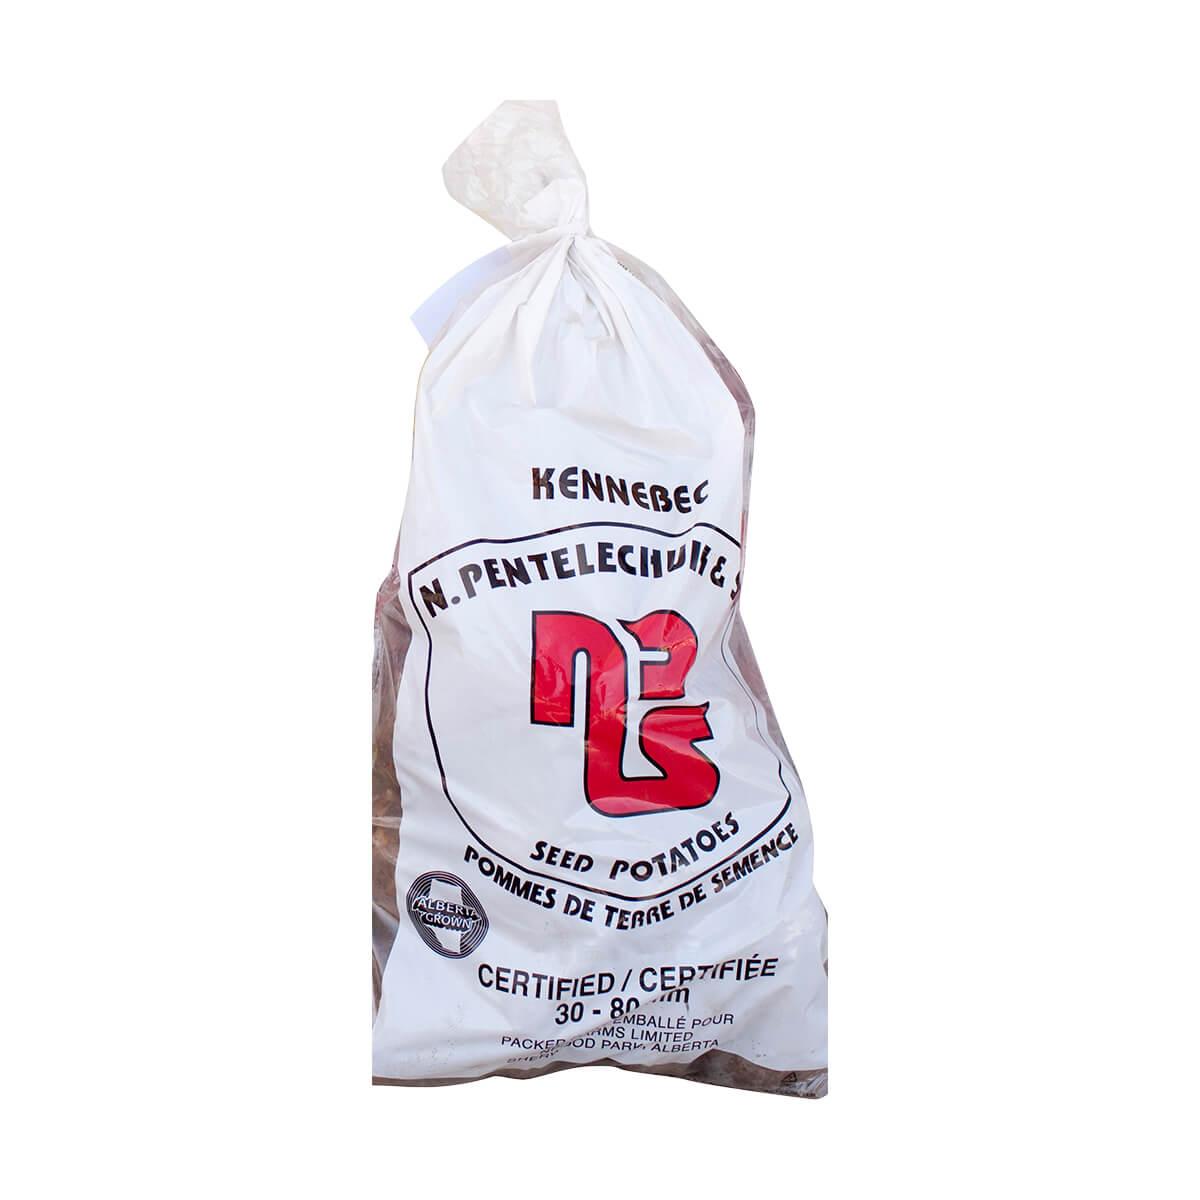 Kennebec Seed Potatoes - 5lb